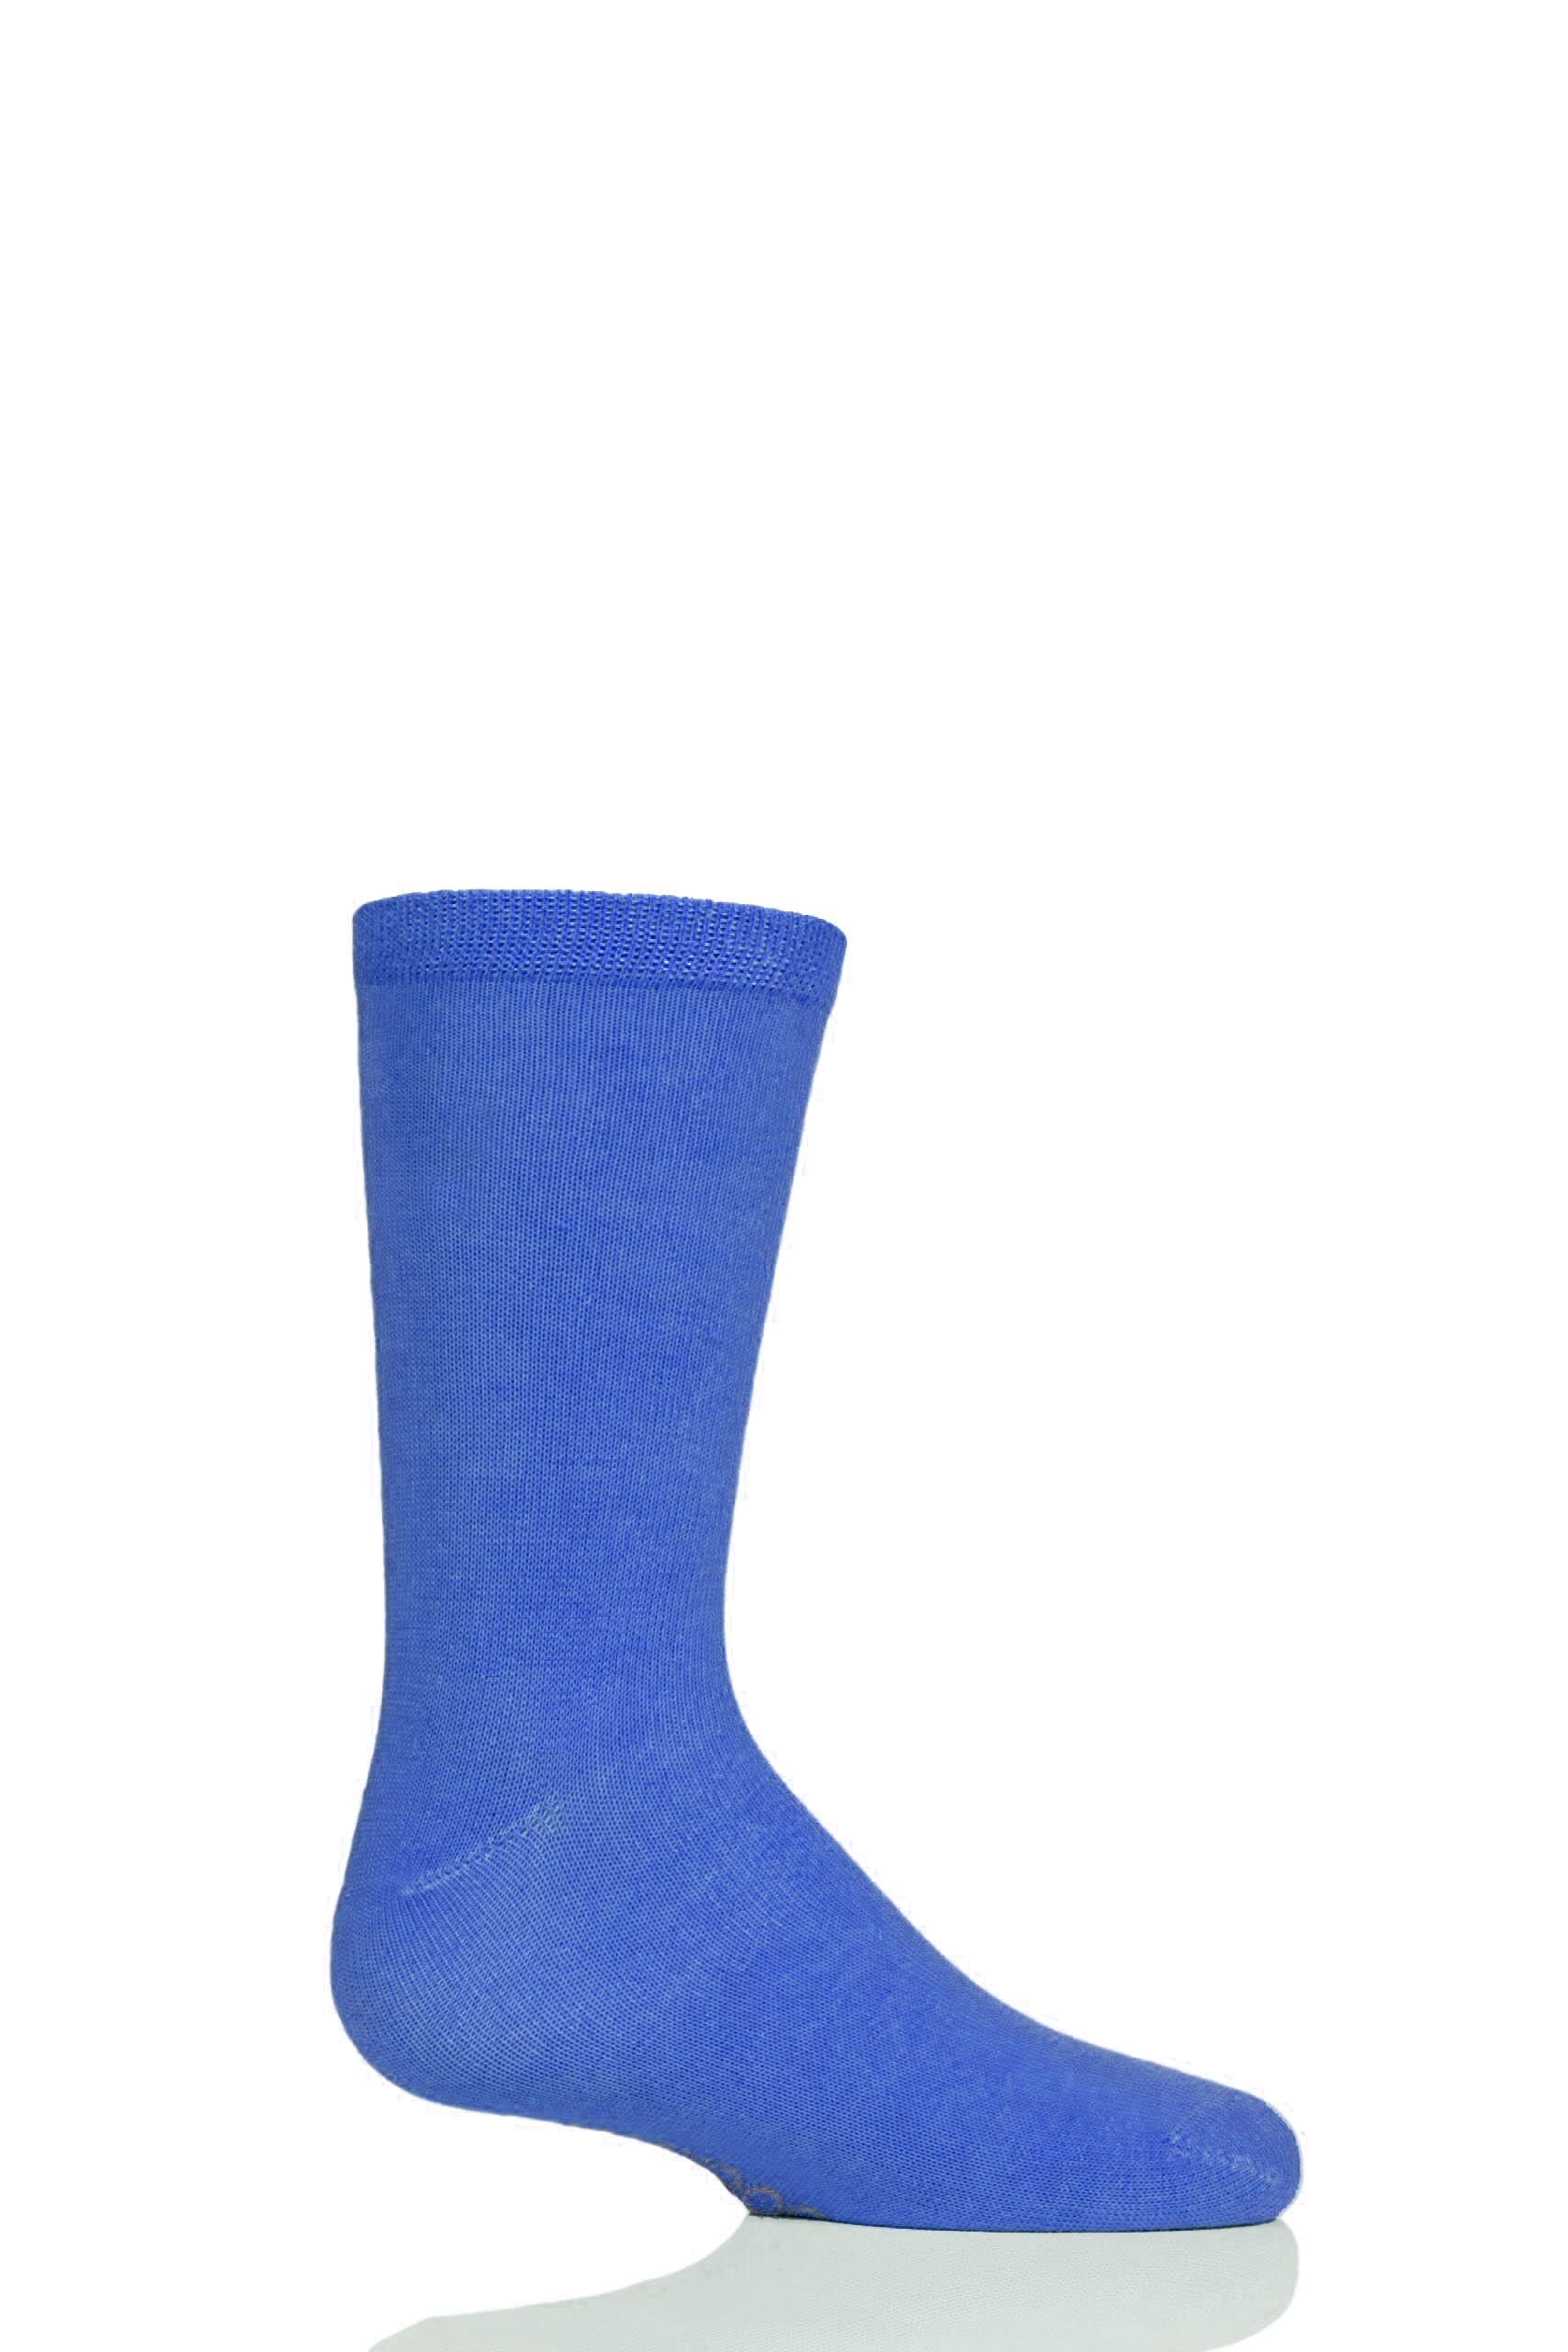 Image of 1 Pair Denim Plain Bamboo Socks with Comfort Cuff and Smooth Toe Seams Kids Unisex 9-12 Kids (4-7 Years) - SOCKSHOP